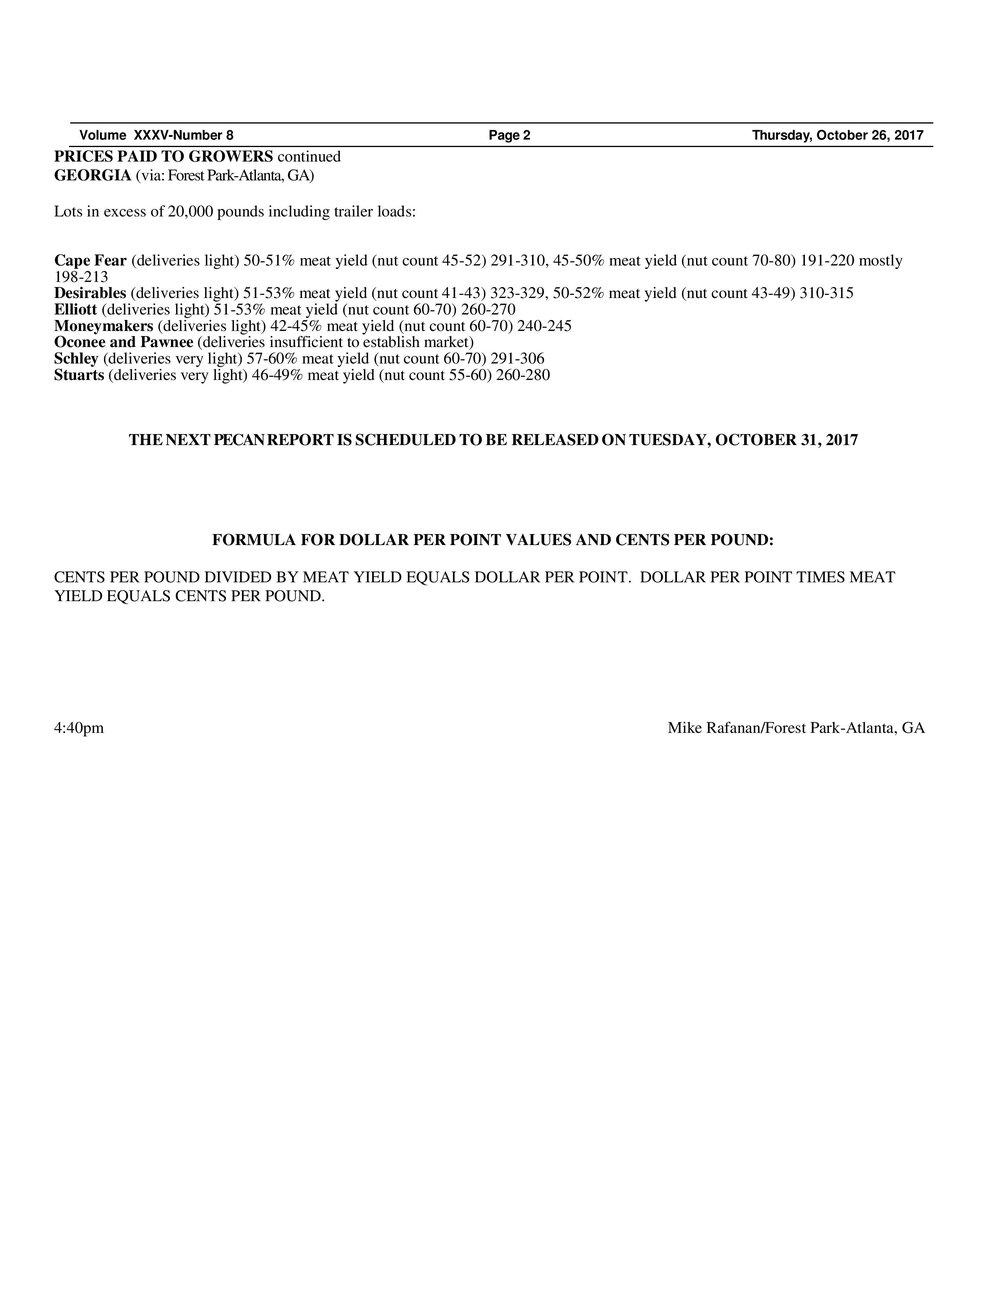 PECAN REPORT 10-26-17-page-002.jpg